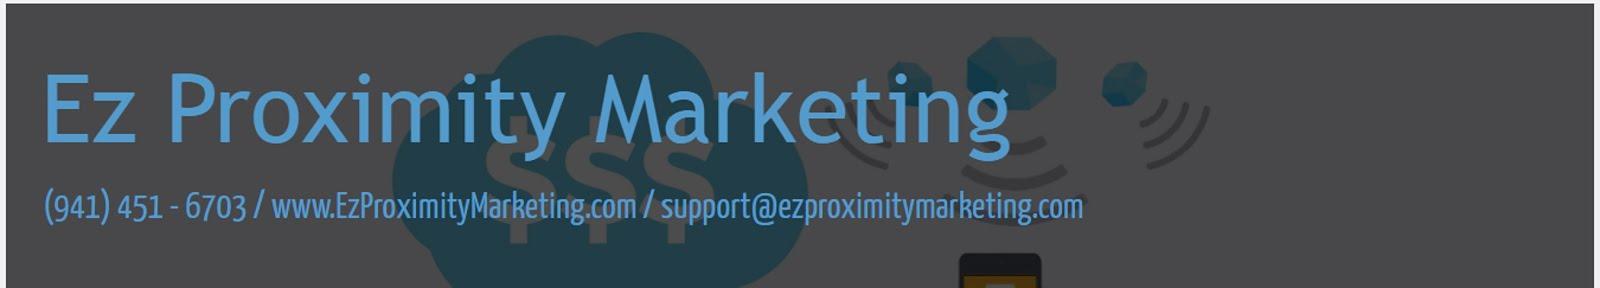 EZ PROXIMITY MARKETING